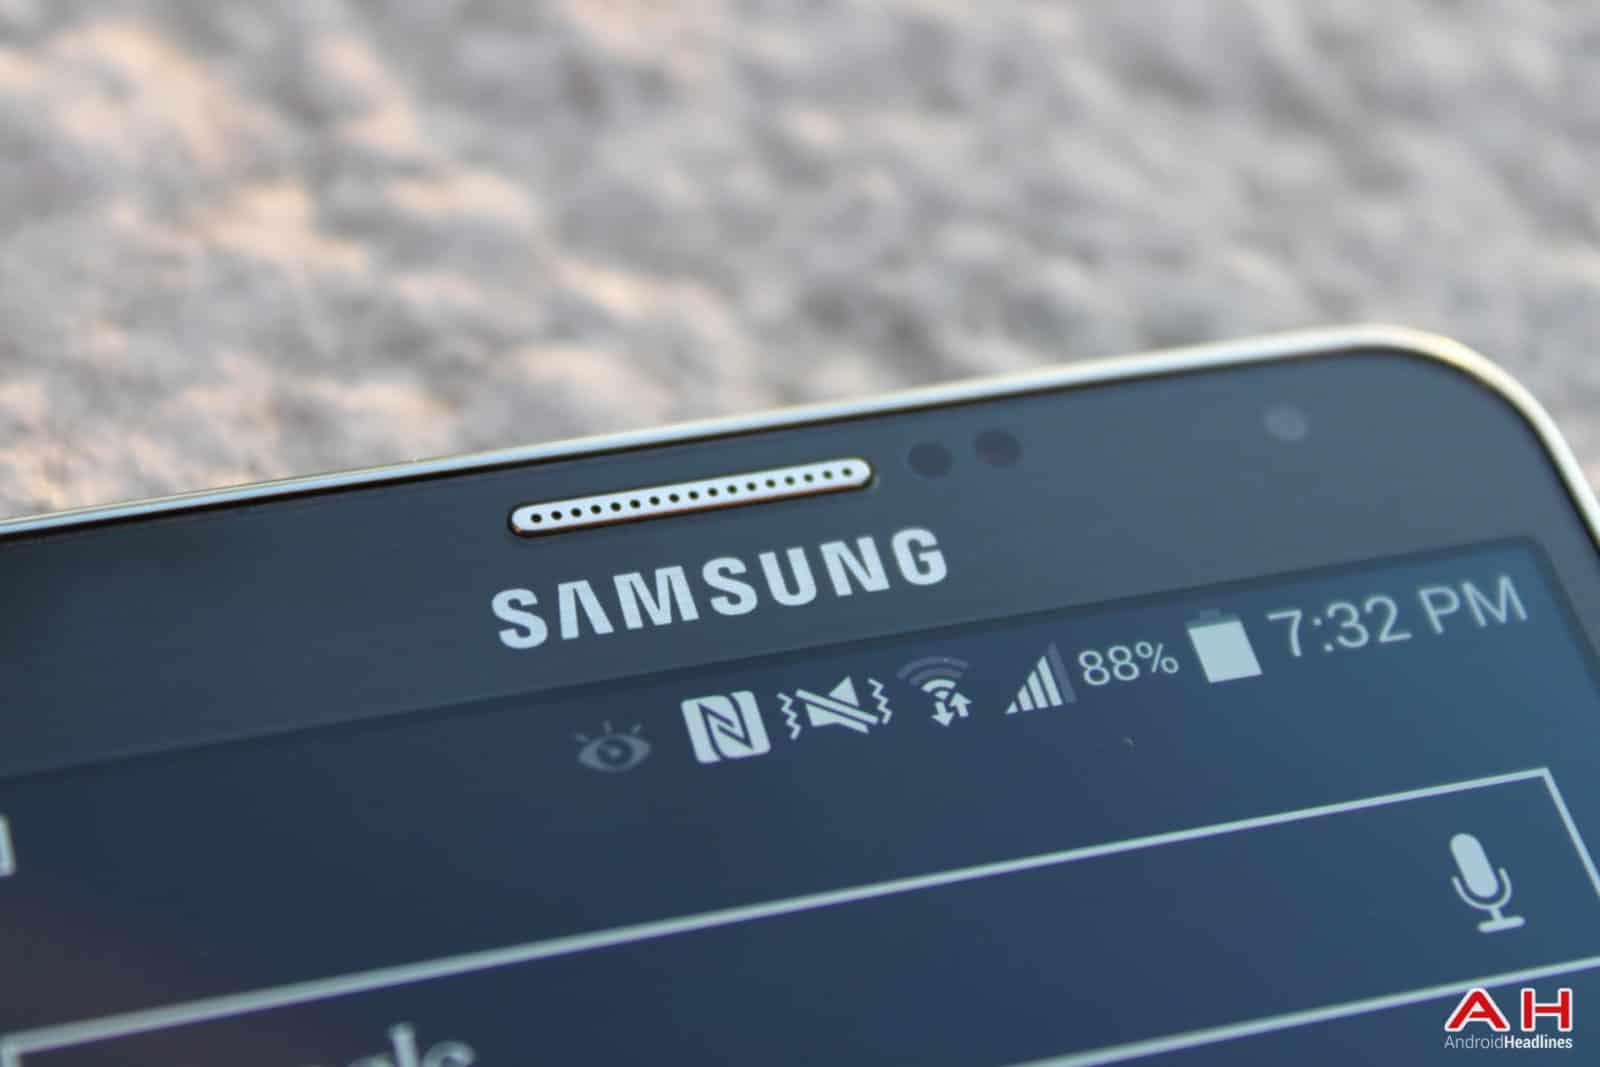 AH Samsung Logo Note 3 3.1